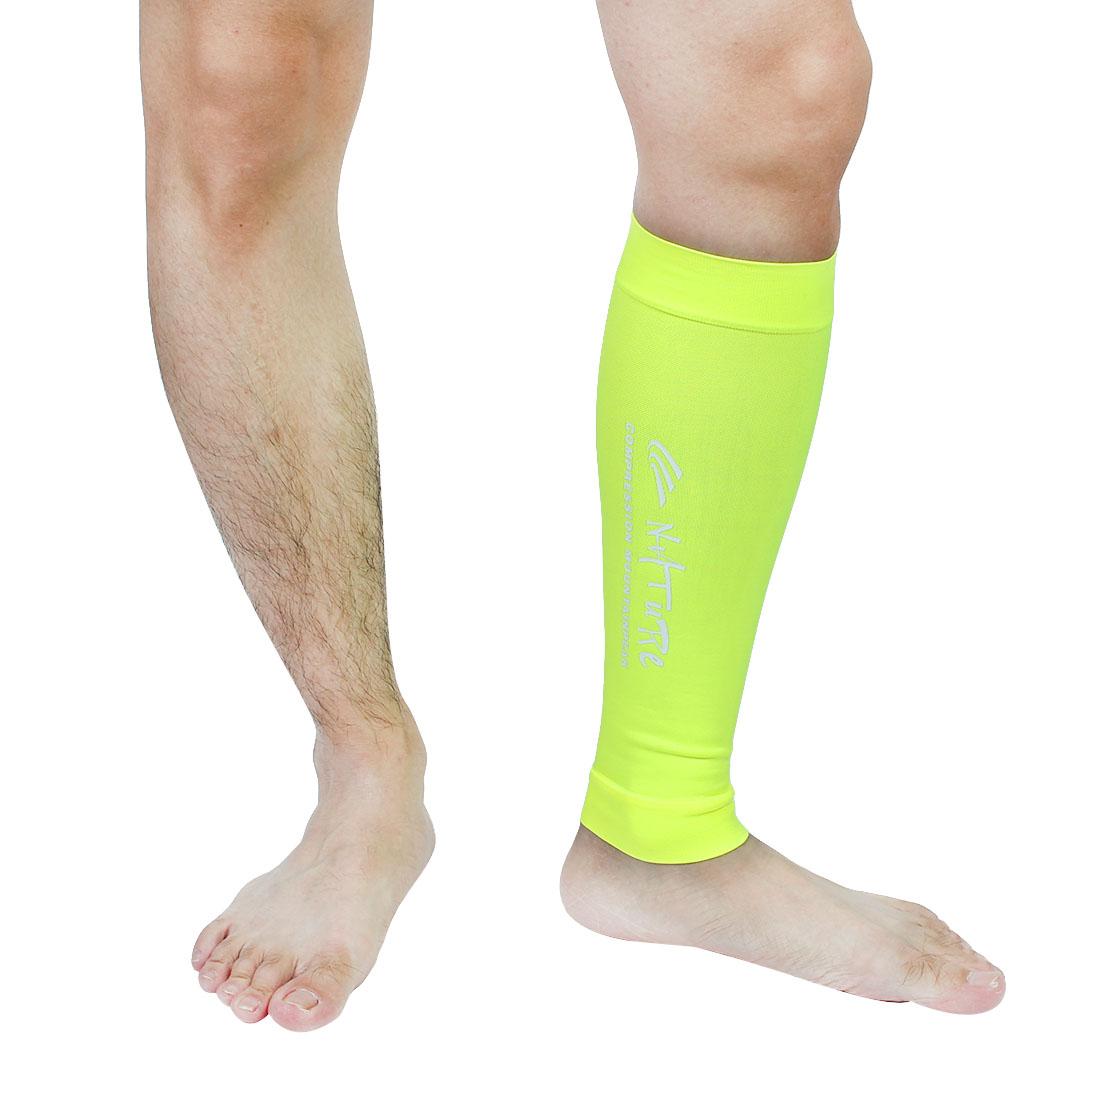 Mountainpeak Authorized Unisex Elastic Polyester Fabric Breathable Sports Cycling Leg Knee Short Sleeve Support #7 L